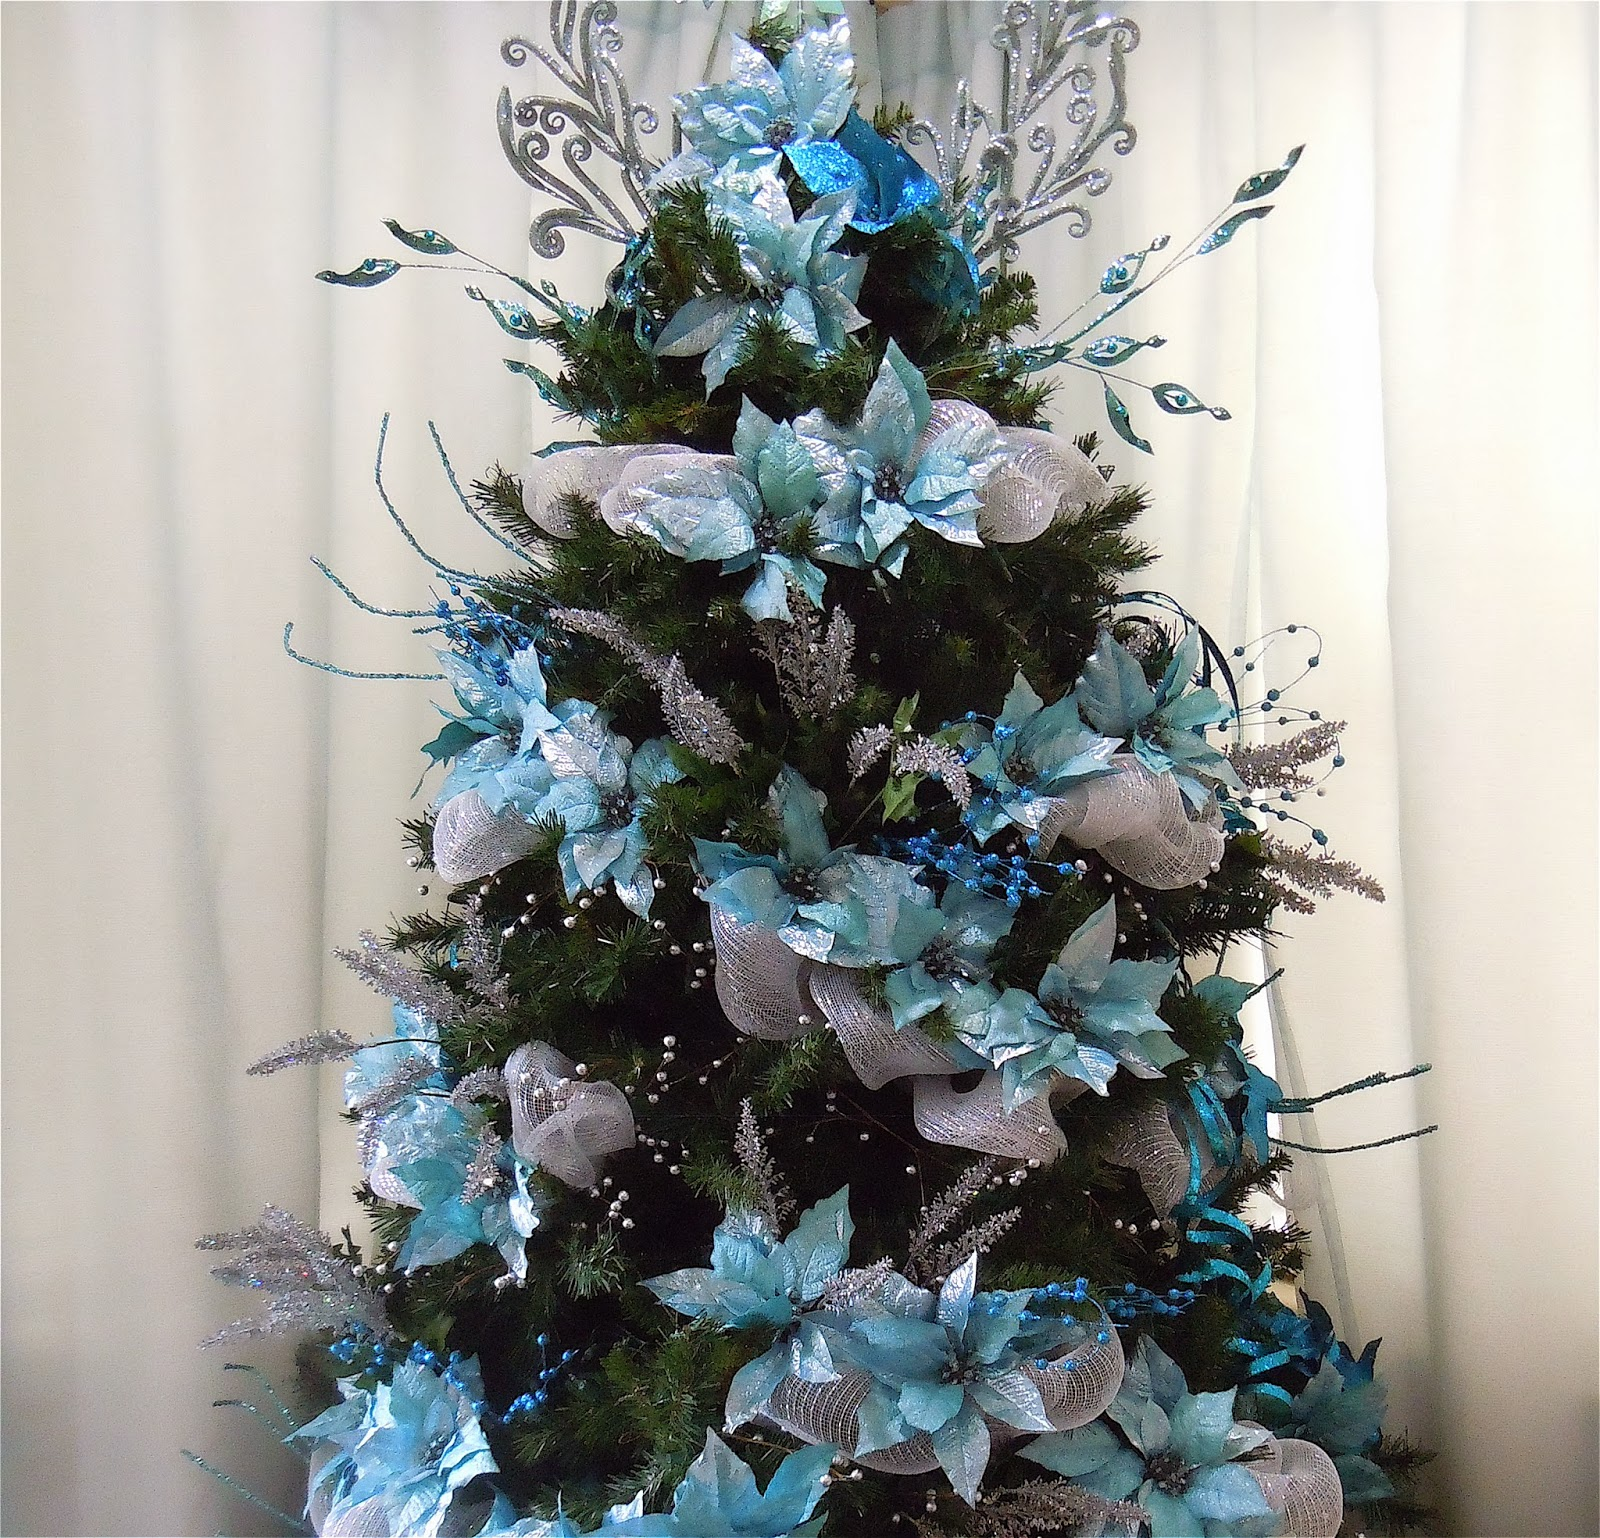 Seasontry: Teal Christmas Tree